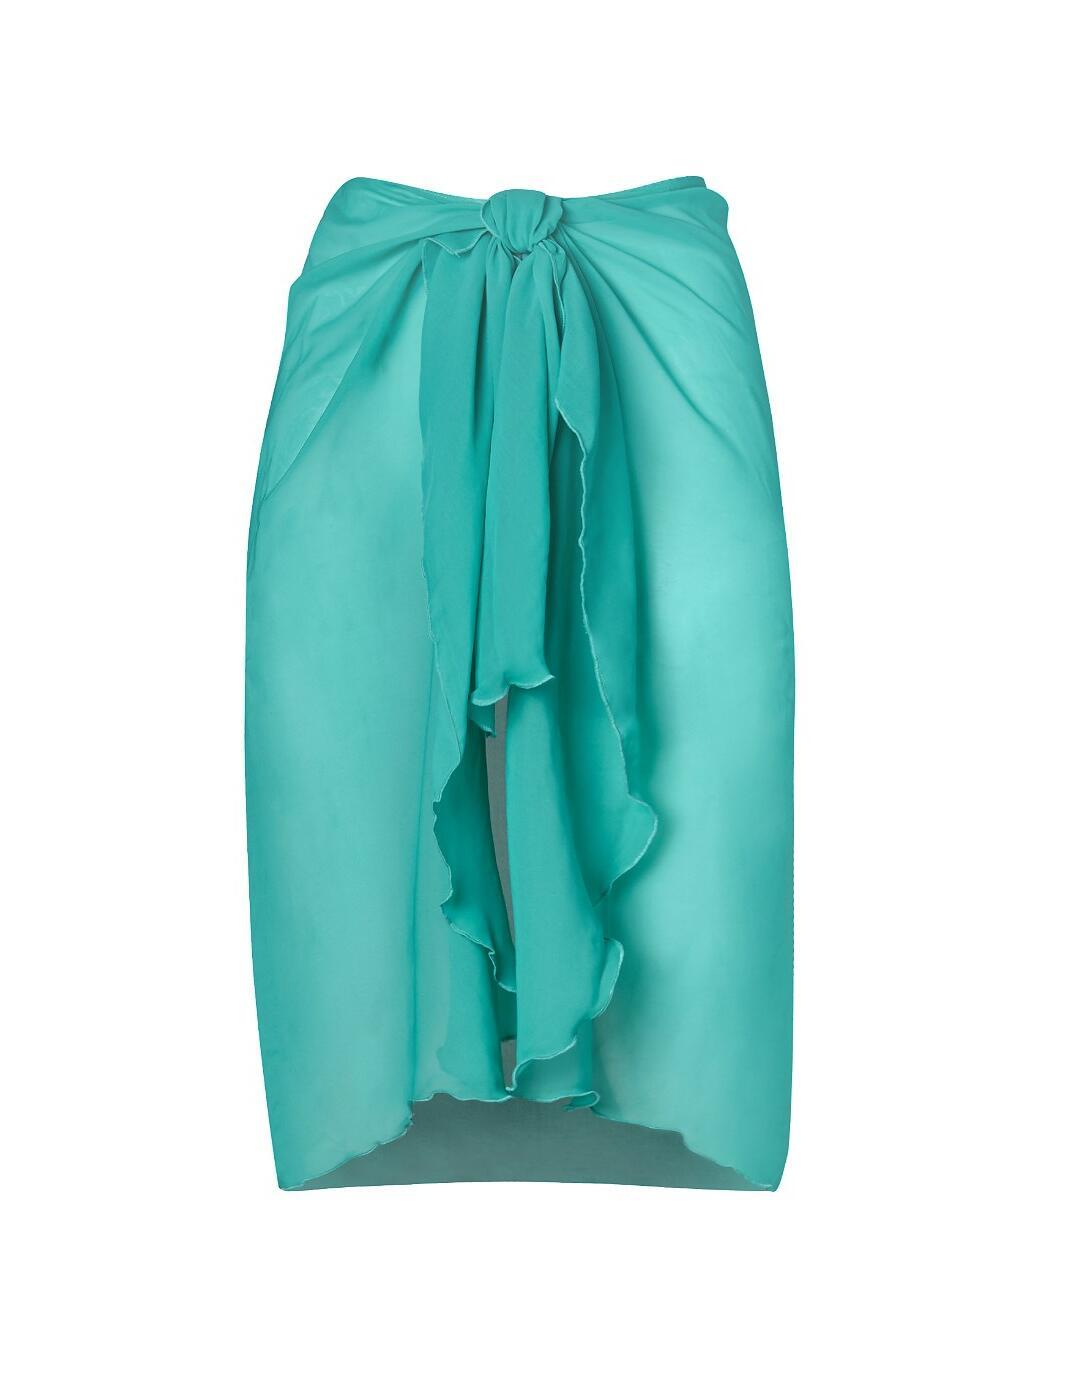 36-3810 SeaSpray Just Colour Plain Waterfall Sarong - 36-3810 Emerald